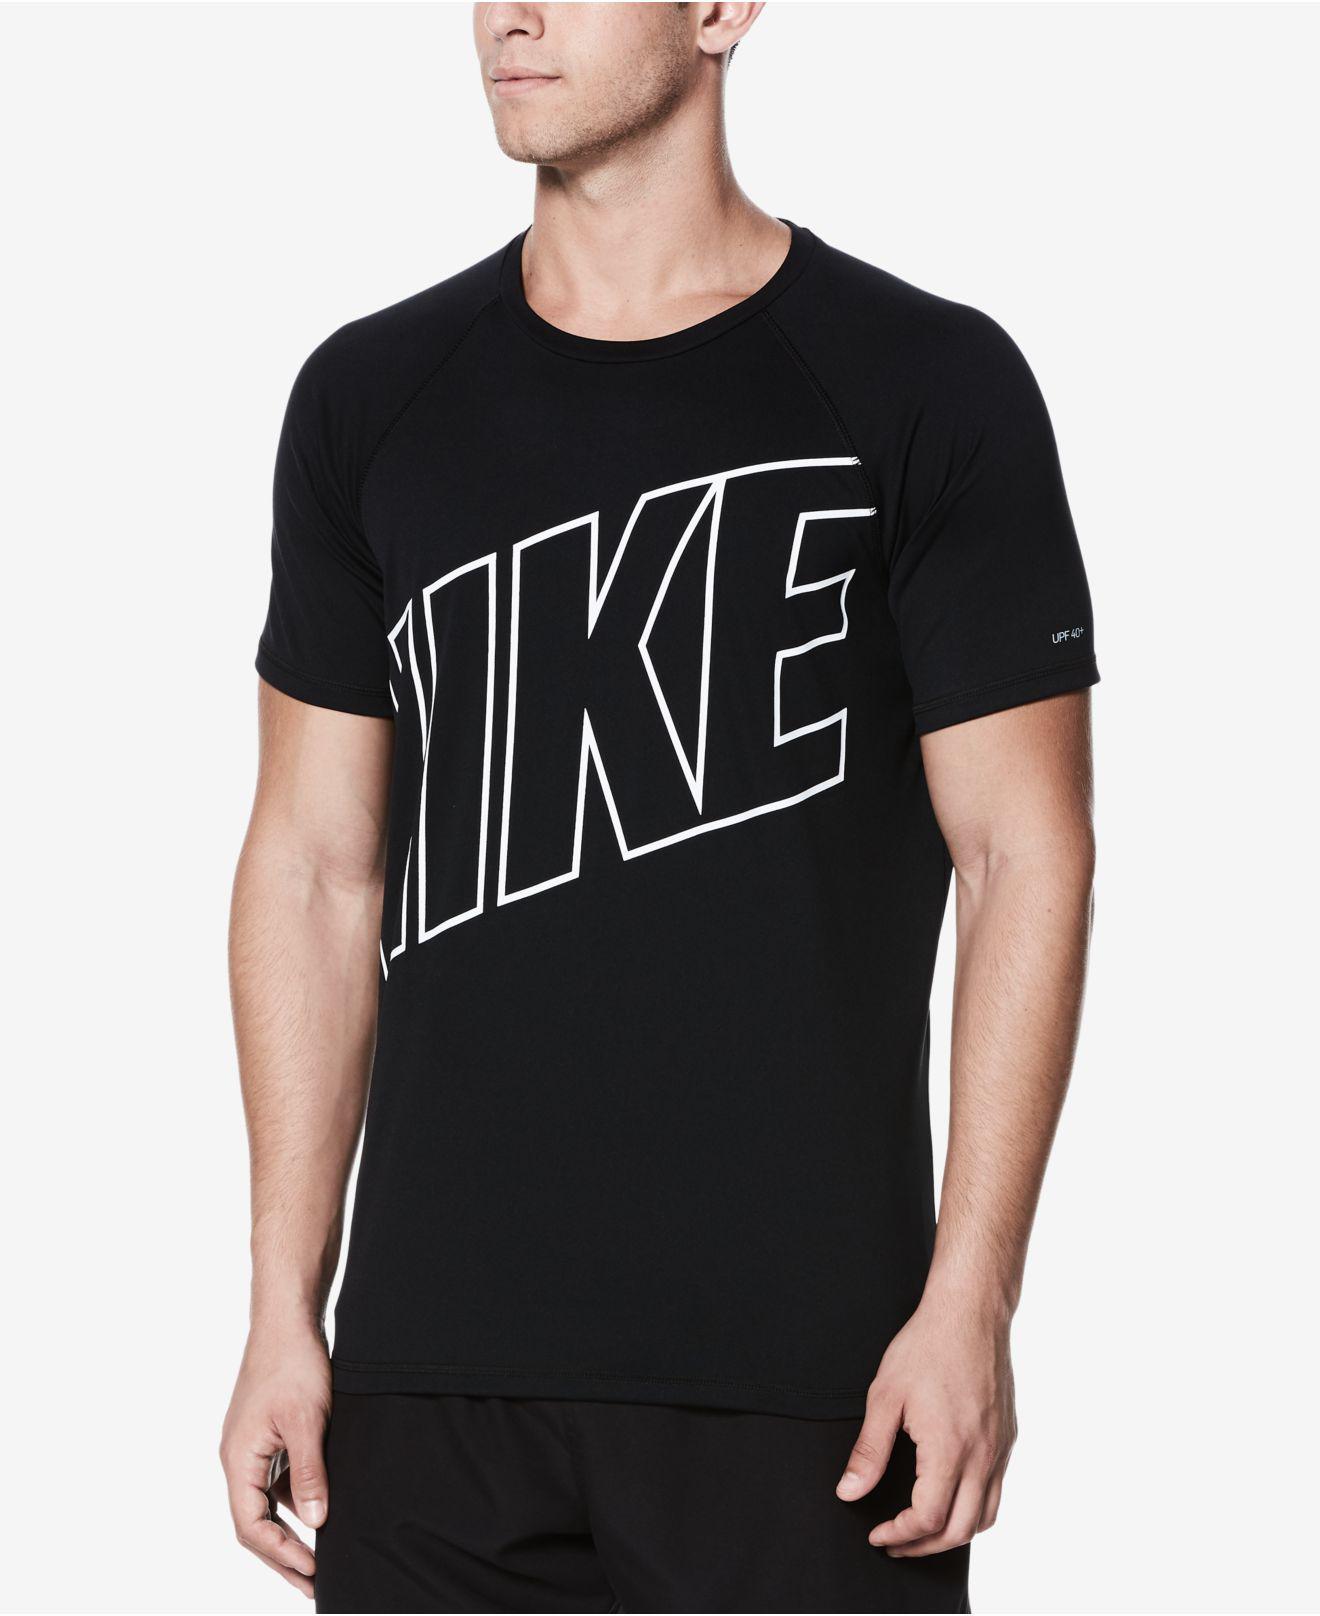 sports shoes 07ebd 6a91a Nike Mens Hydroguard Swim Shirt